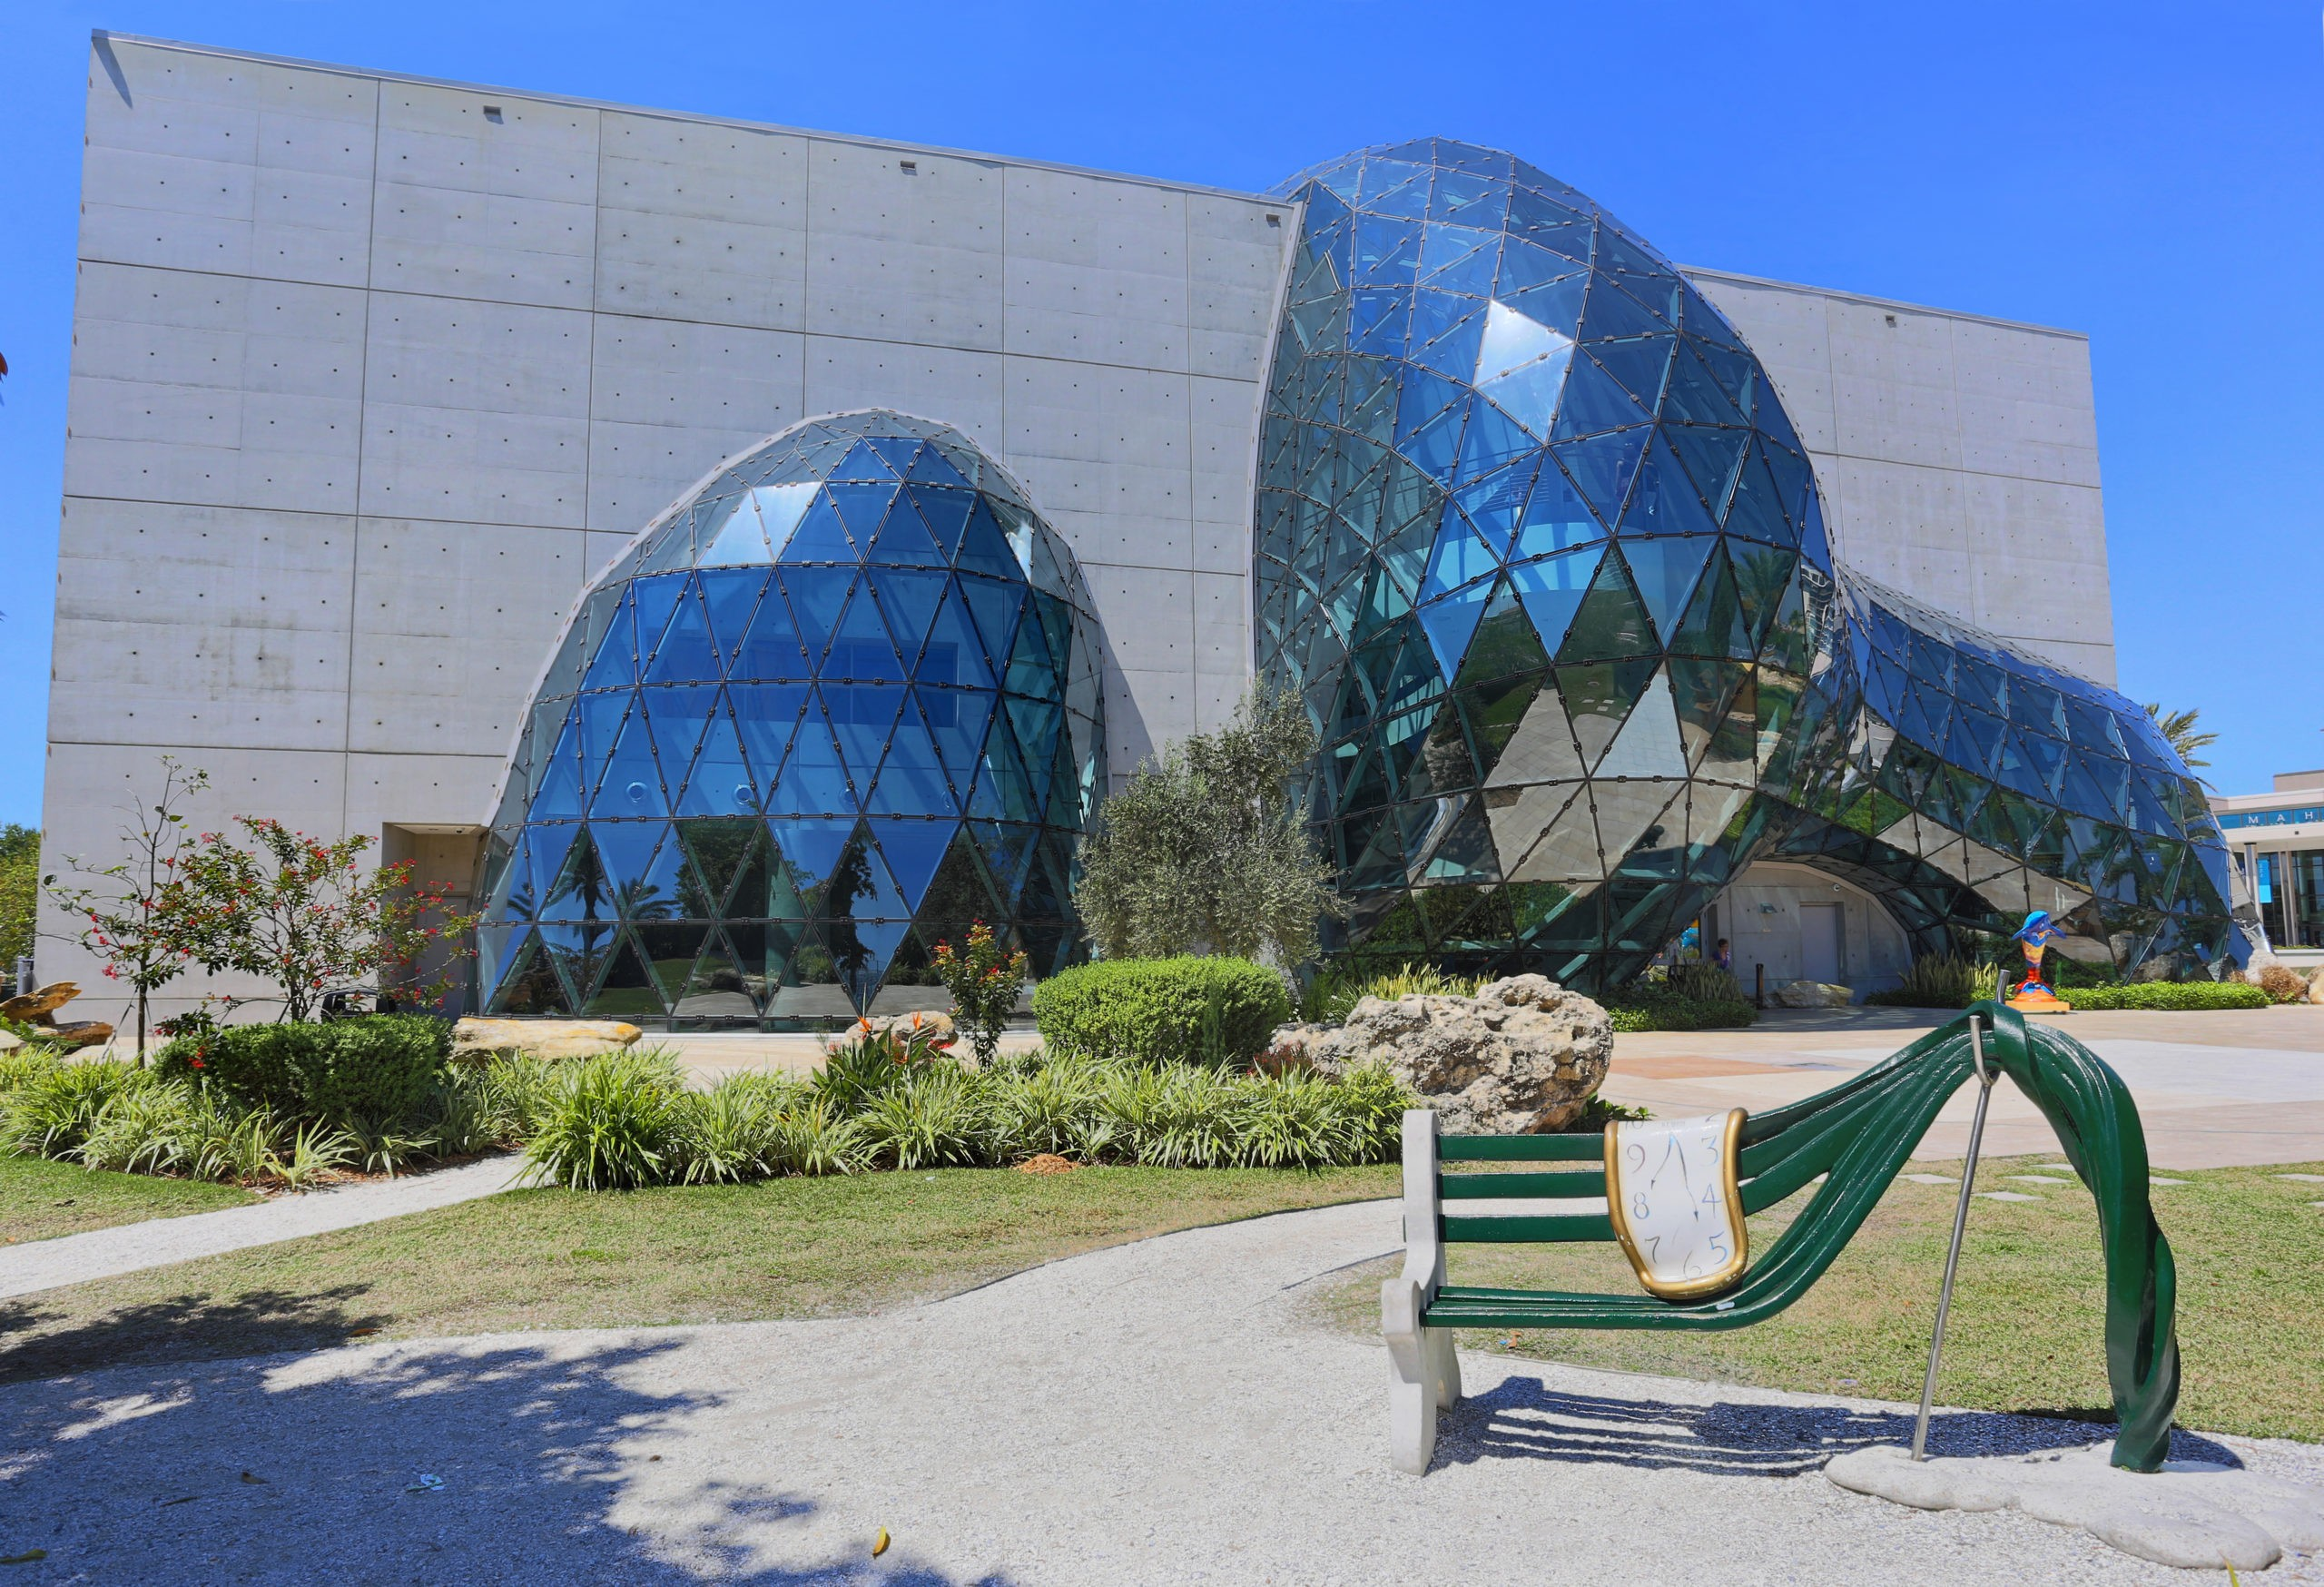 ST. PETERSBURG, FLORYDA, Salvador Dali Museum. licencja: shutterstock/By Alexander Sviridov